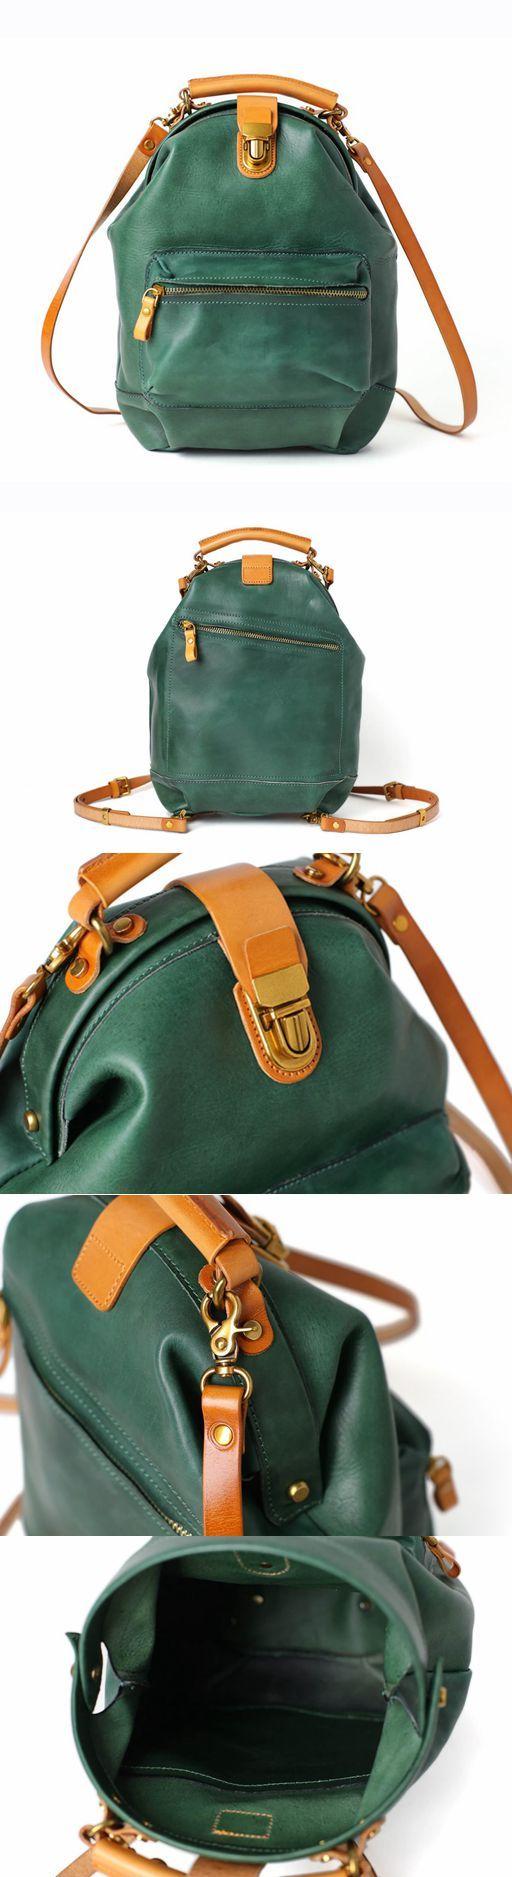 Handmade Full Grain Leather Backpack,  Shoulder Bags, Casual Satchel Bag 14107